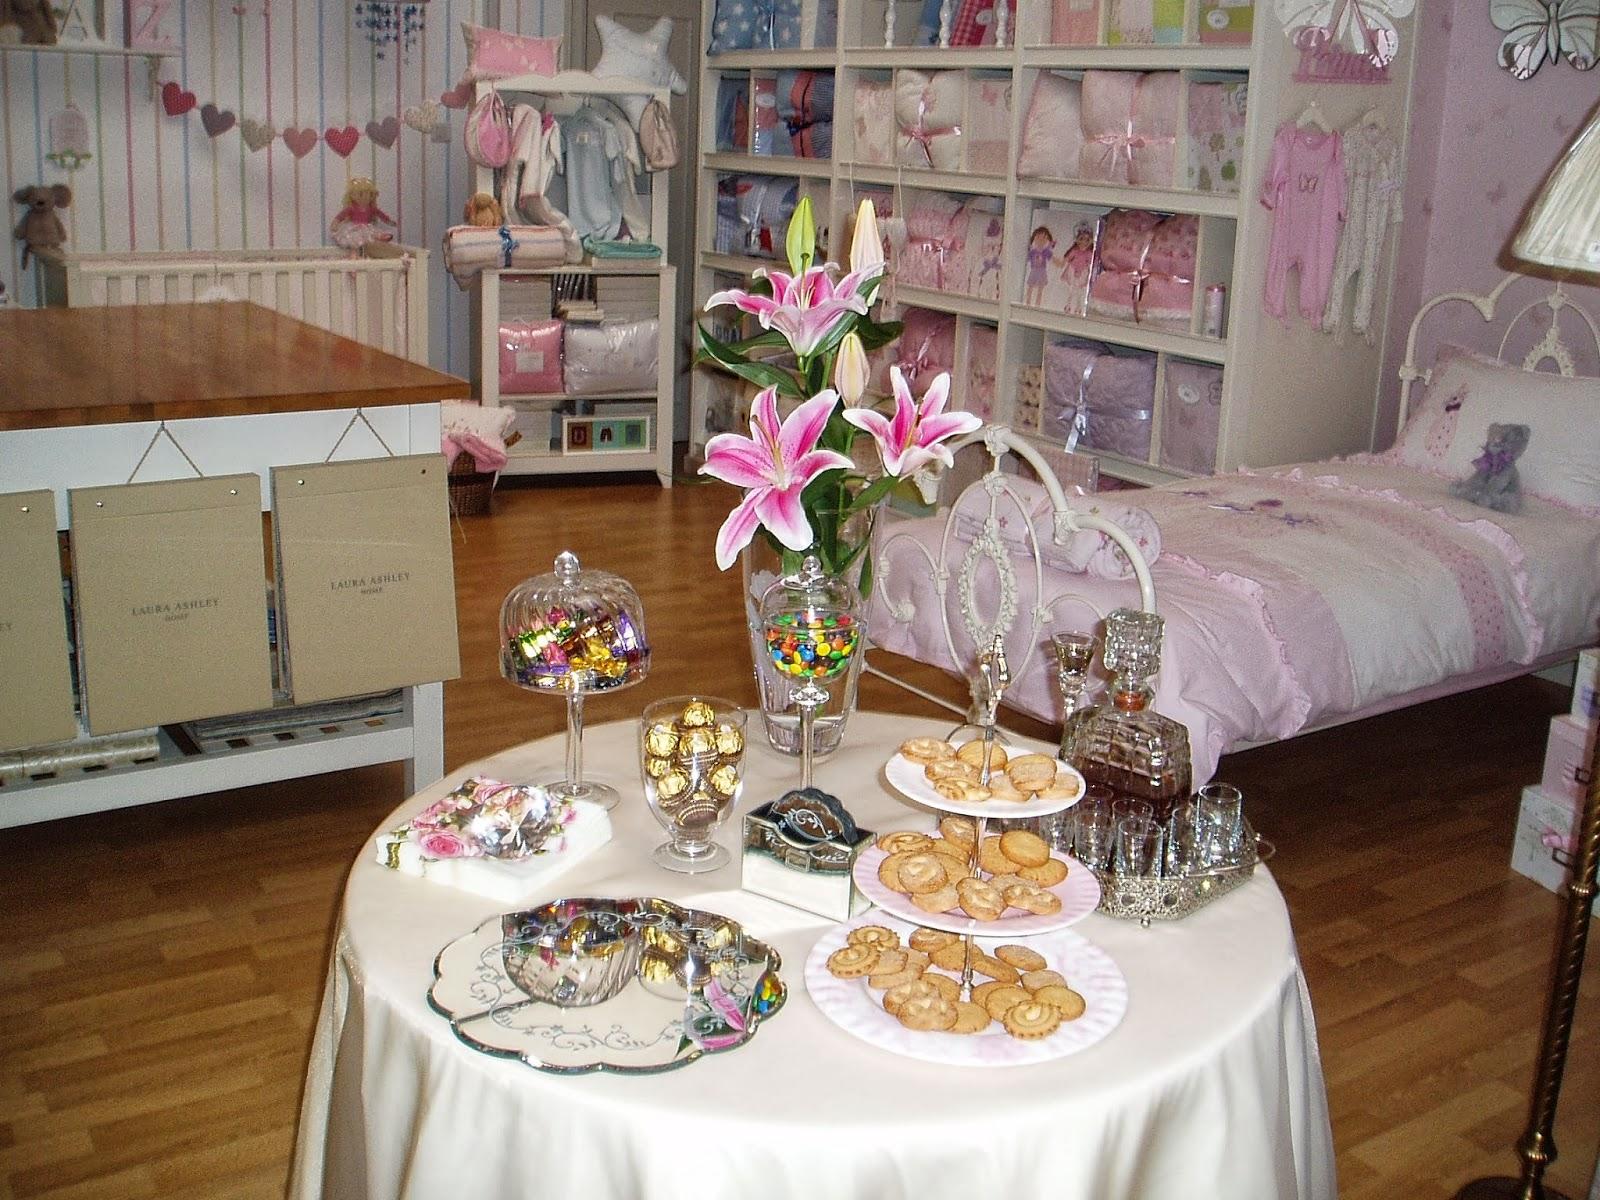 El blog de decoracion de laura ashley un cumplea os - Laura ashley zaragoza ...